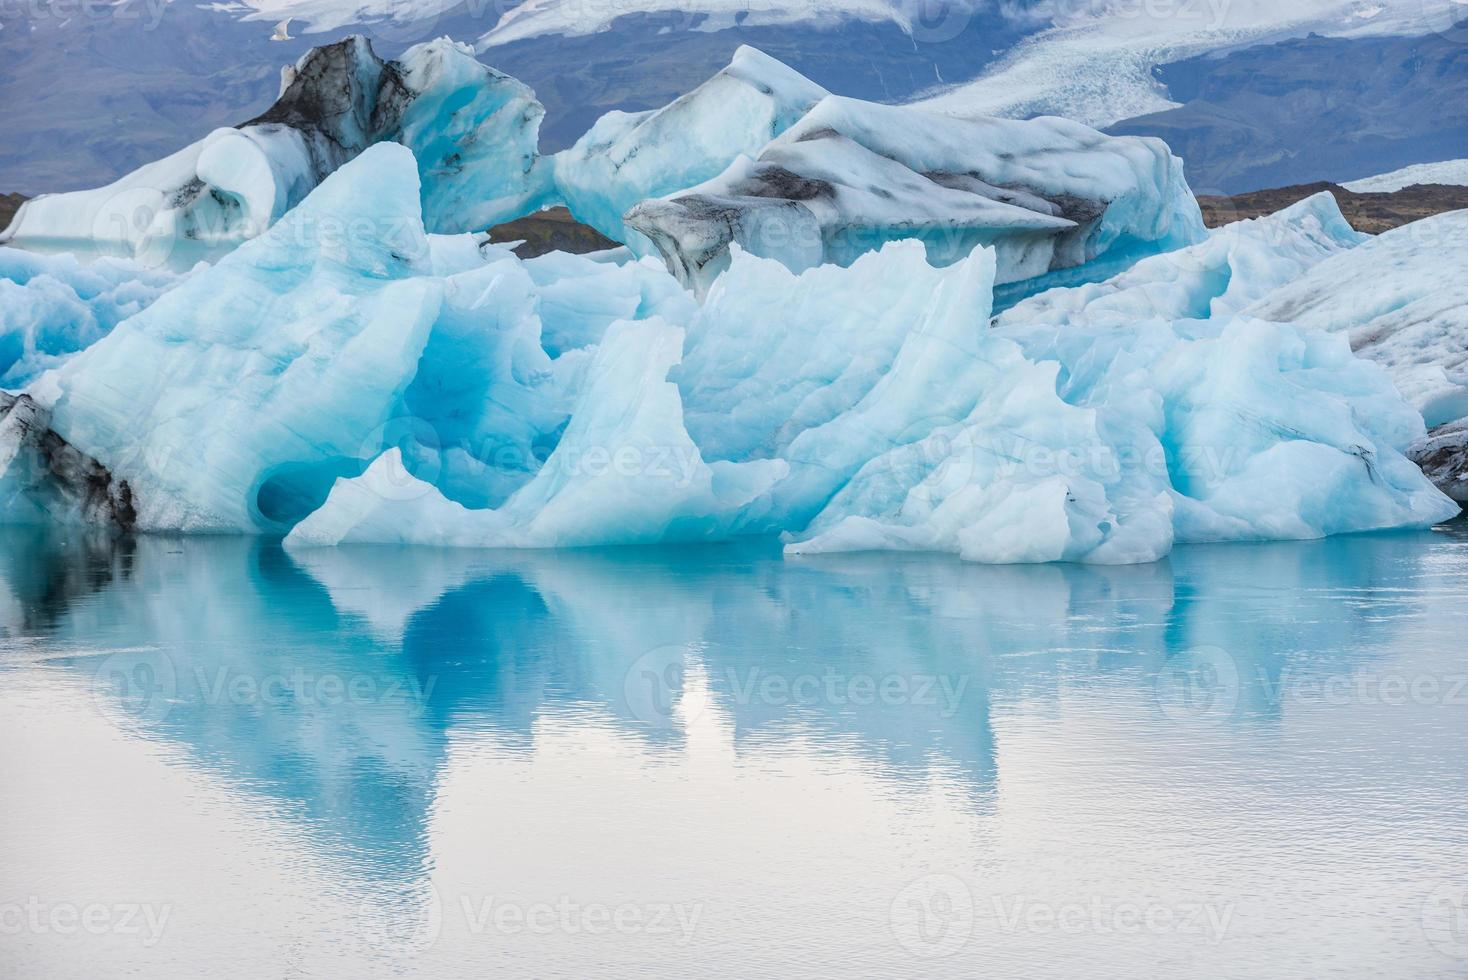 Detial view of iceberg in ice lagoon - Jokulsarlon, Iceland. photo